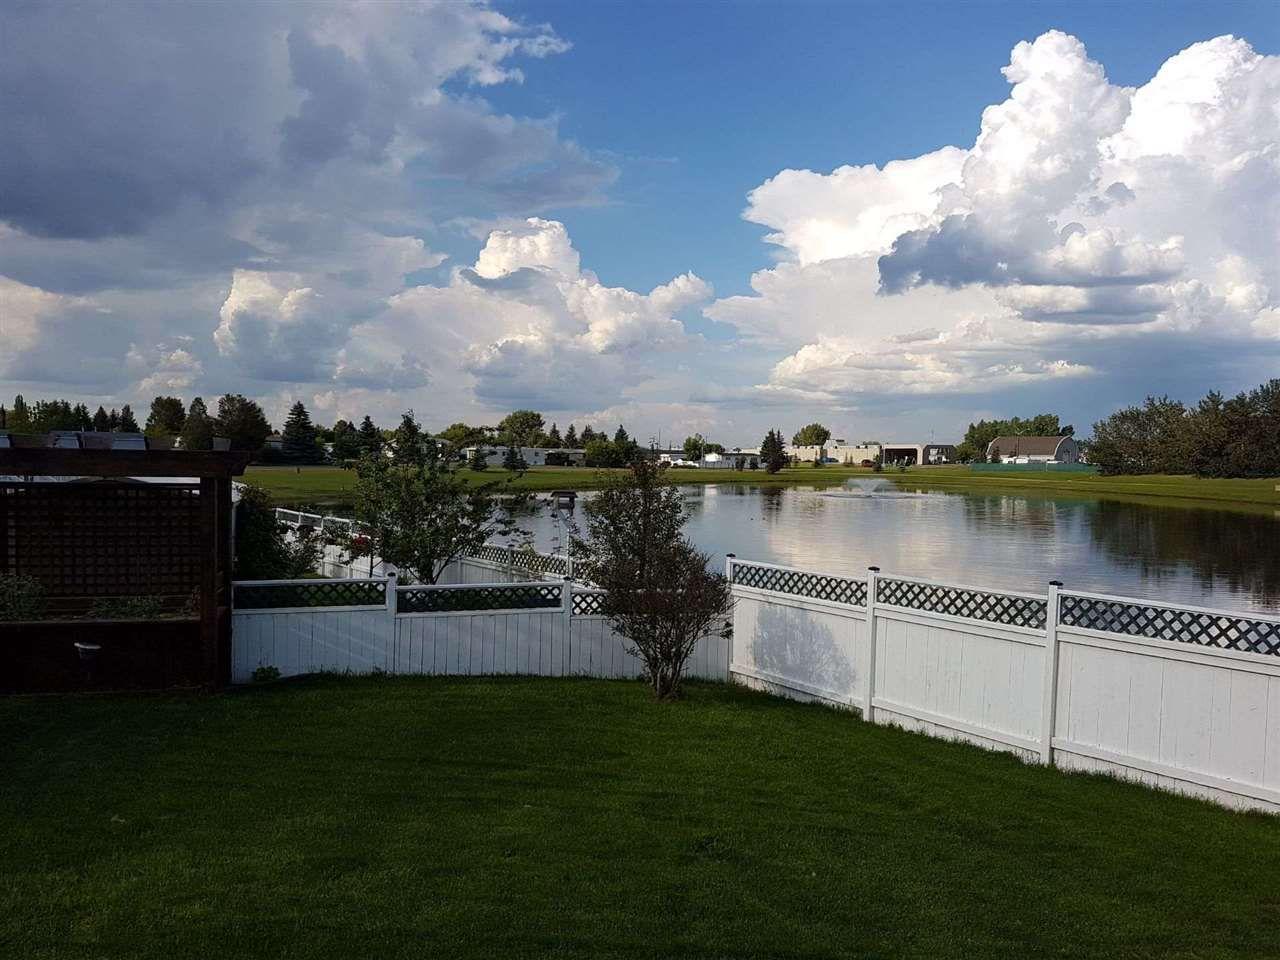 Main Photo: 2805 Lakeside CRES in Edmonton: Zone 59 Mobile for sale : MLS®# E4147618